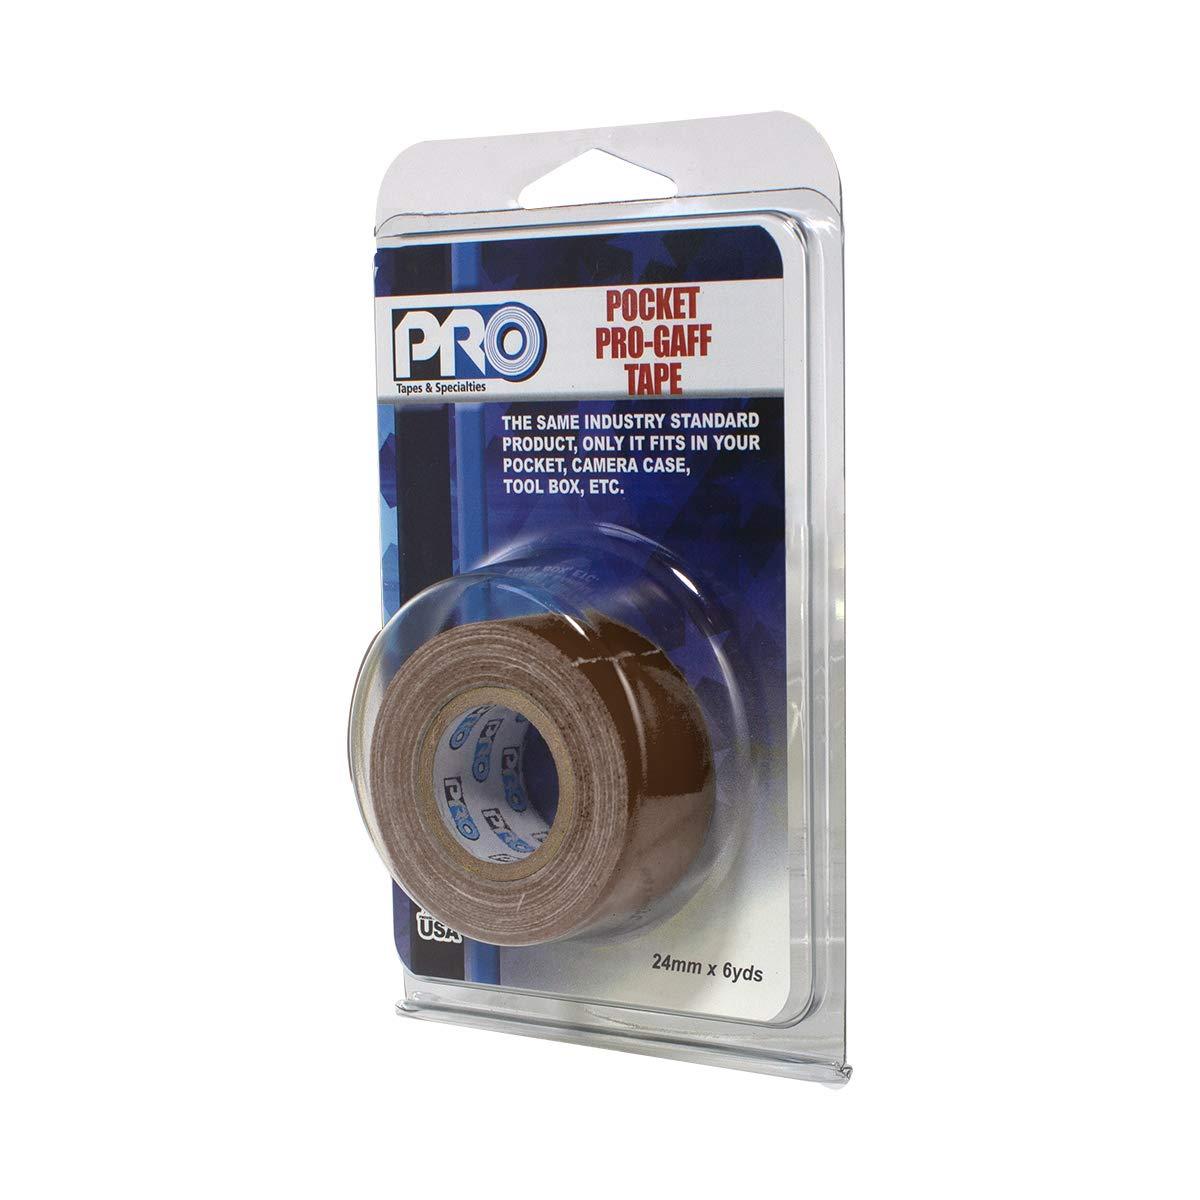 Electric Blue 1 x 6 yd ProTapes 306GB16MELEBLU1 PRO Pocket Gaff Tape